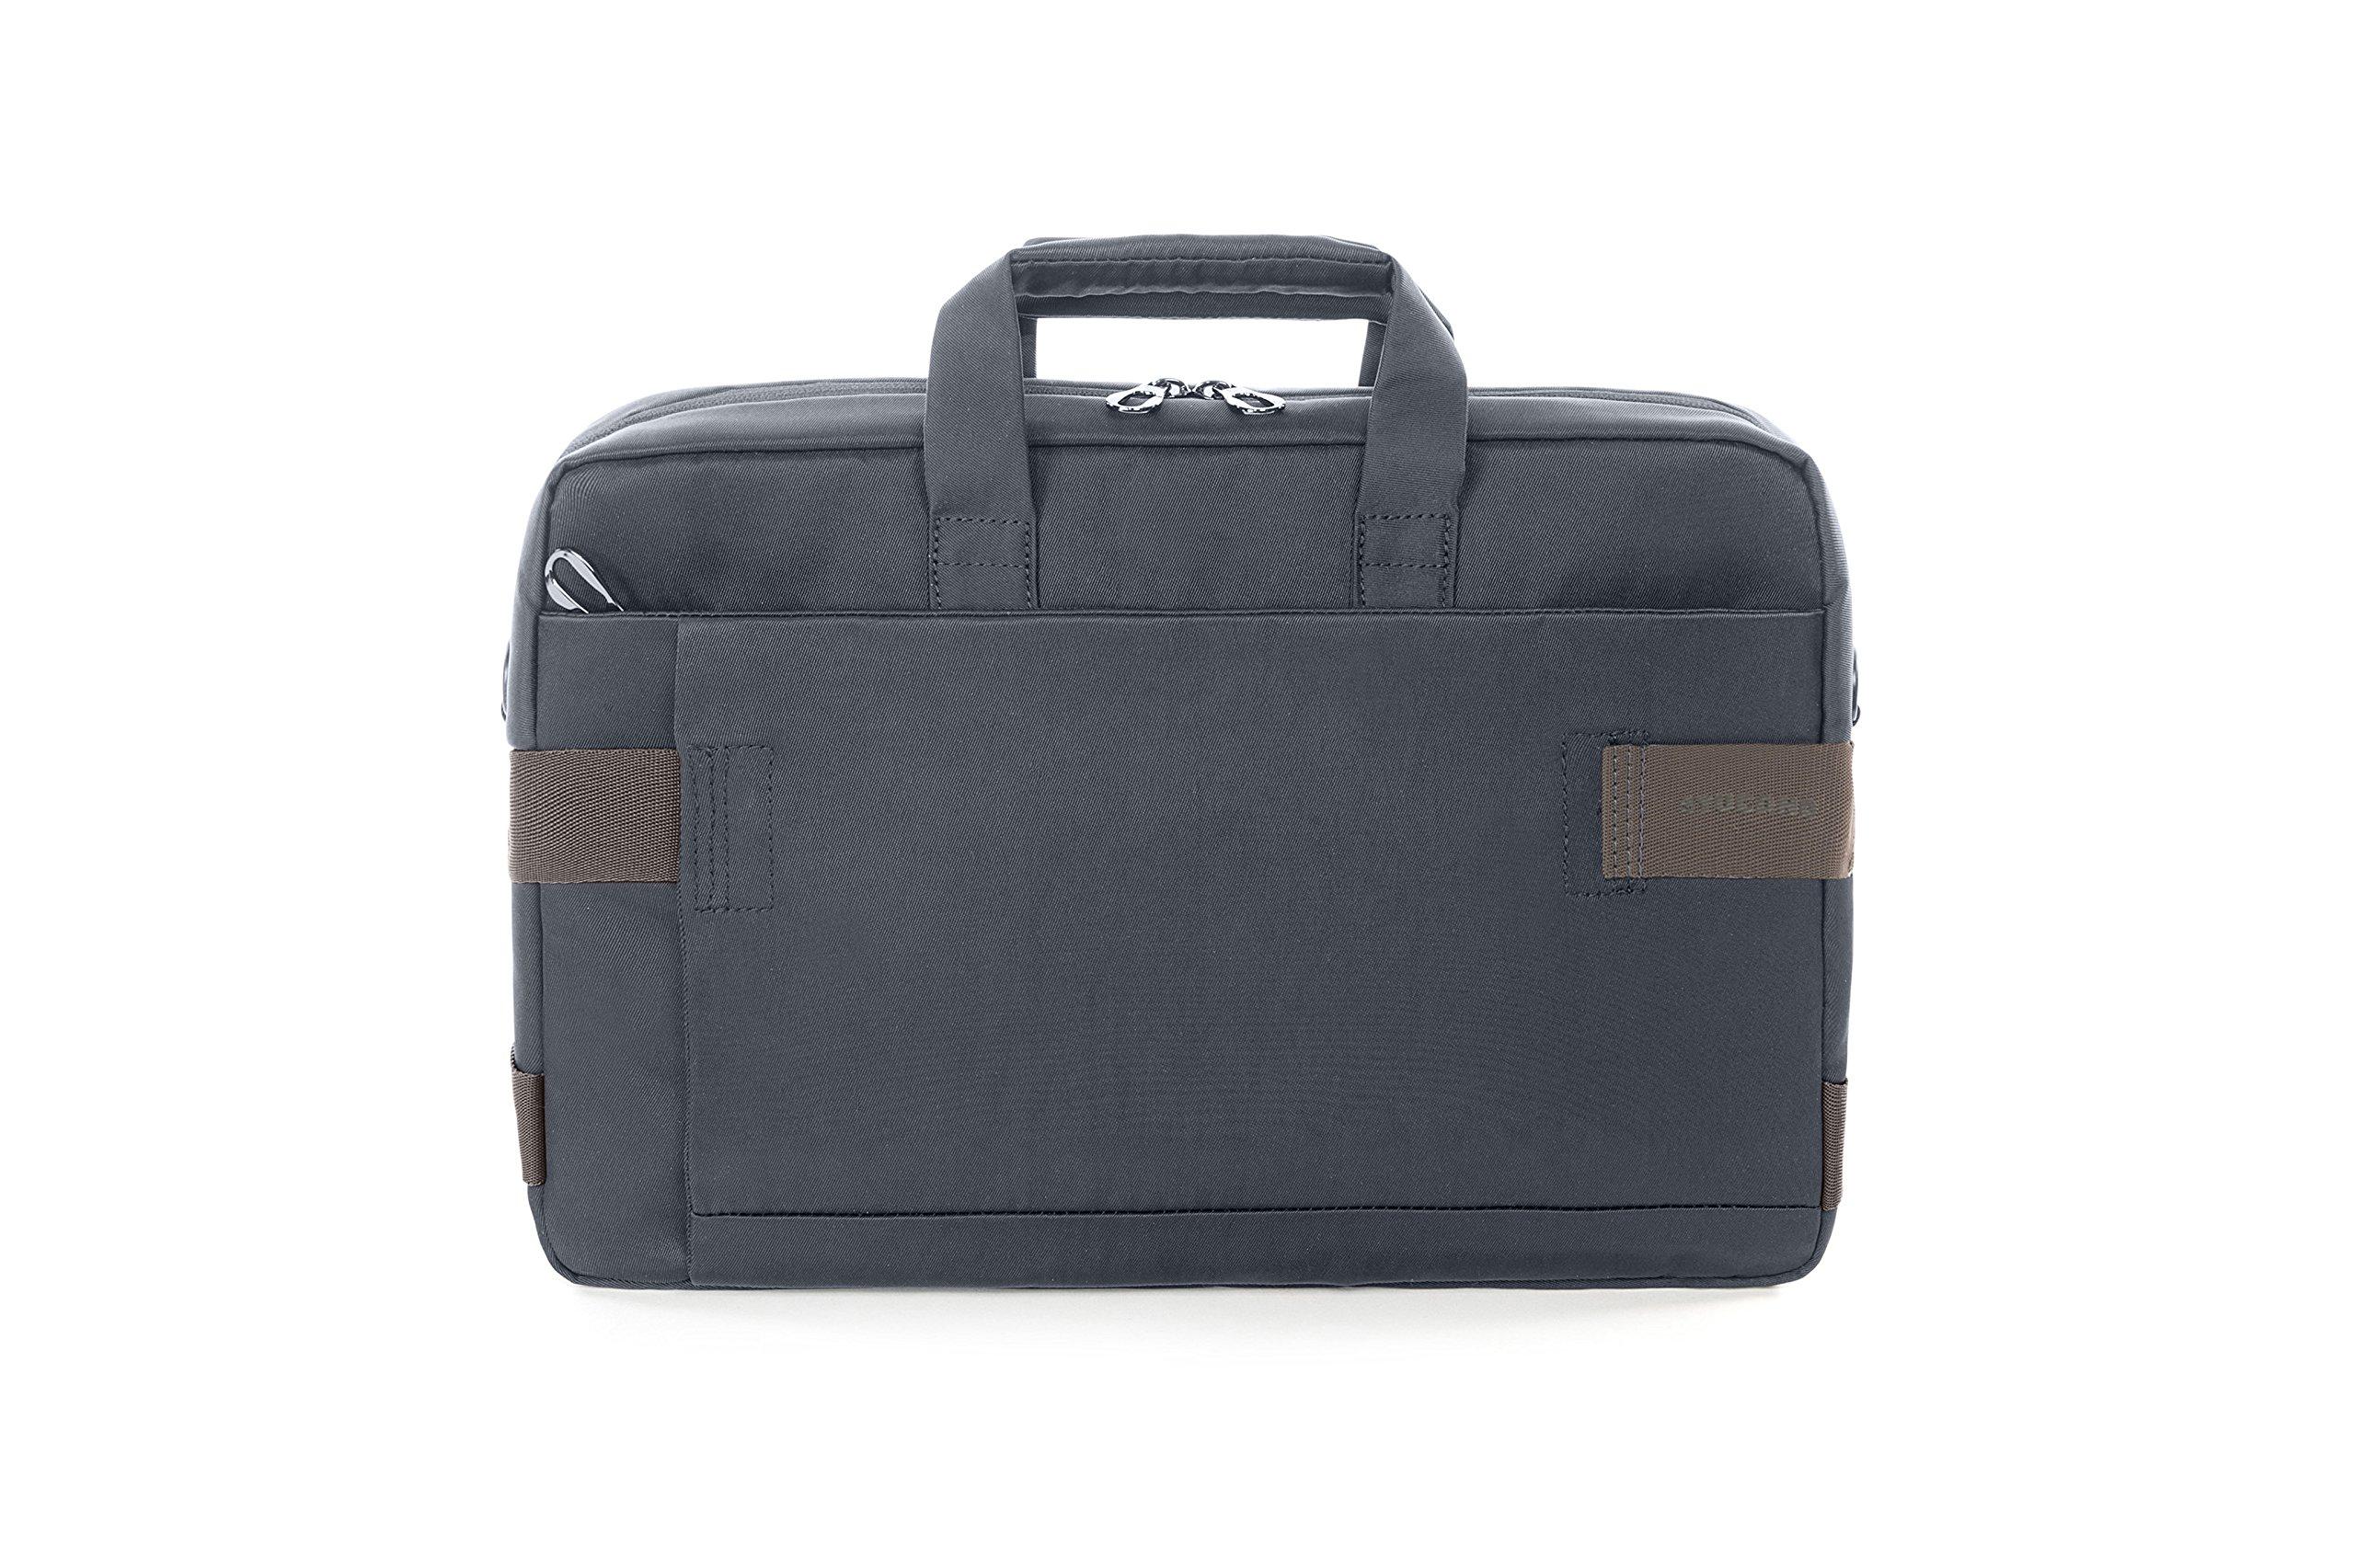 Tucano BSTR15-B Laptop Computer Bags & Cases